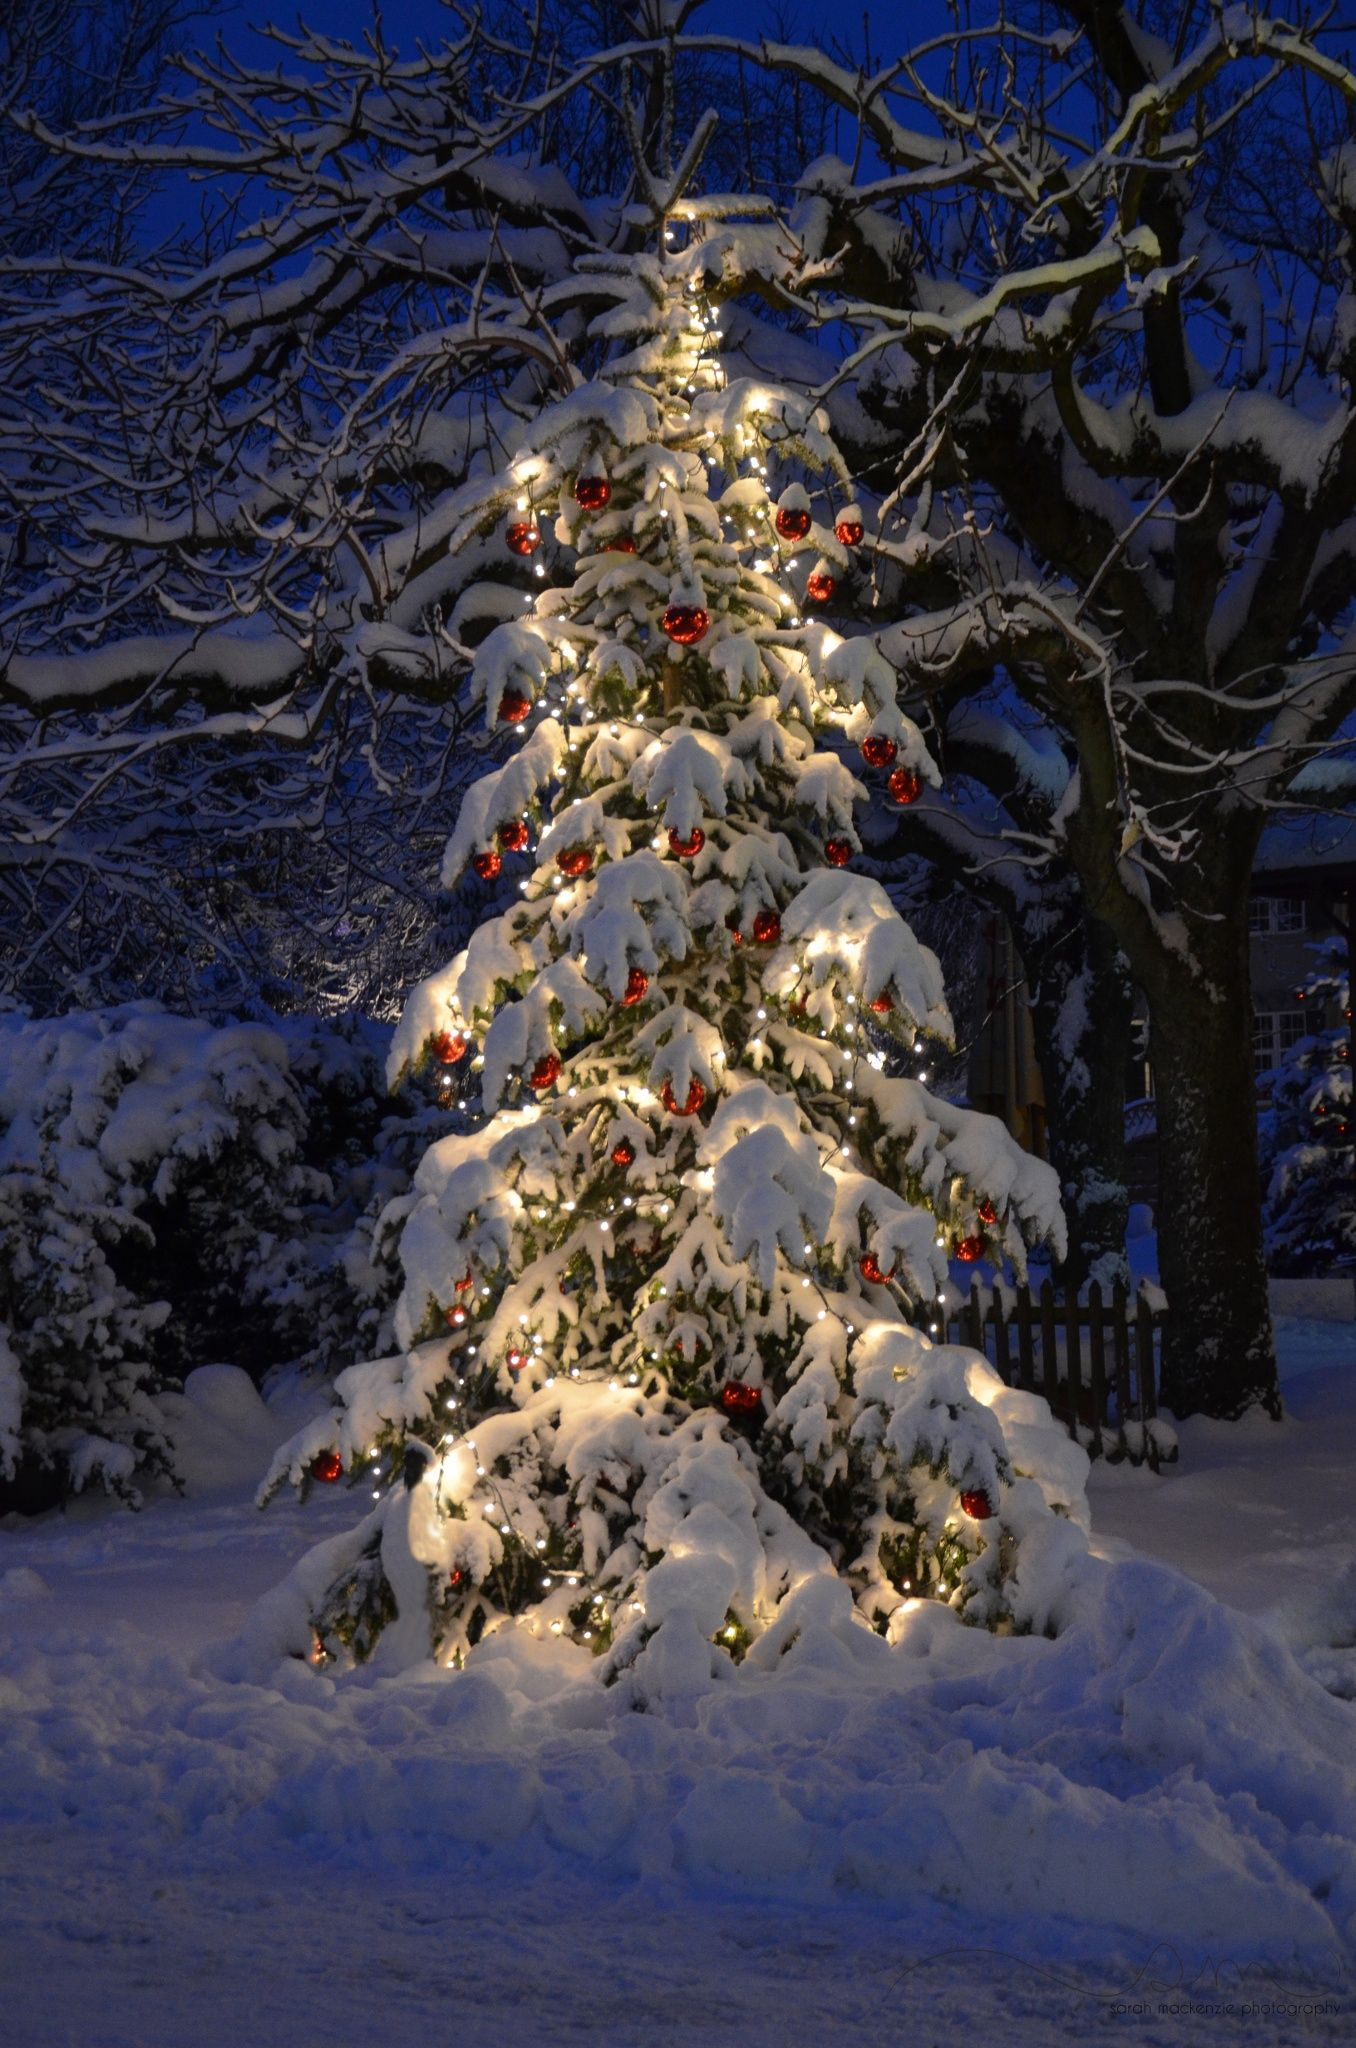 Winter Christmas Tree Outdoor Christmas Tree At Night With Lights And Snow Outdoor Christmas Tree Christmas Scenery Outdoor Christmas